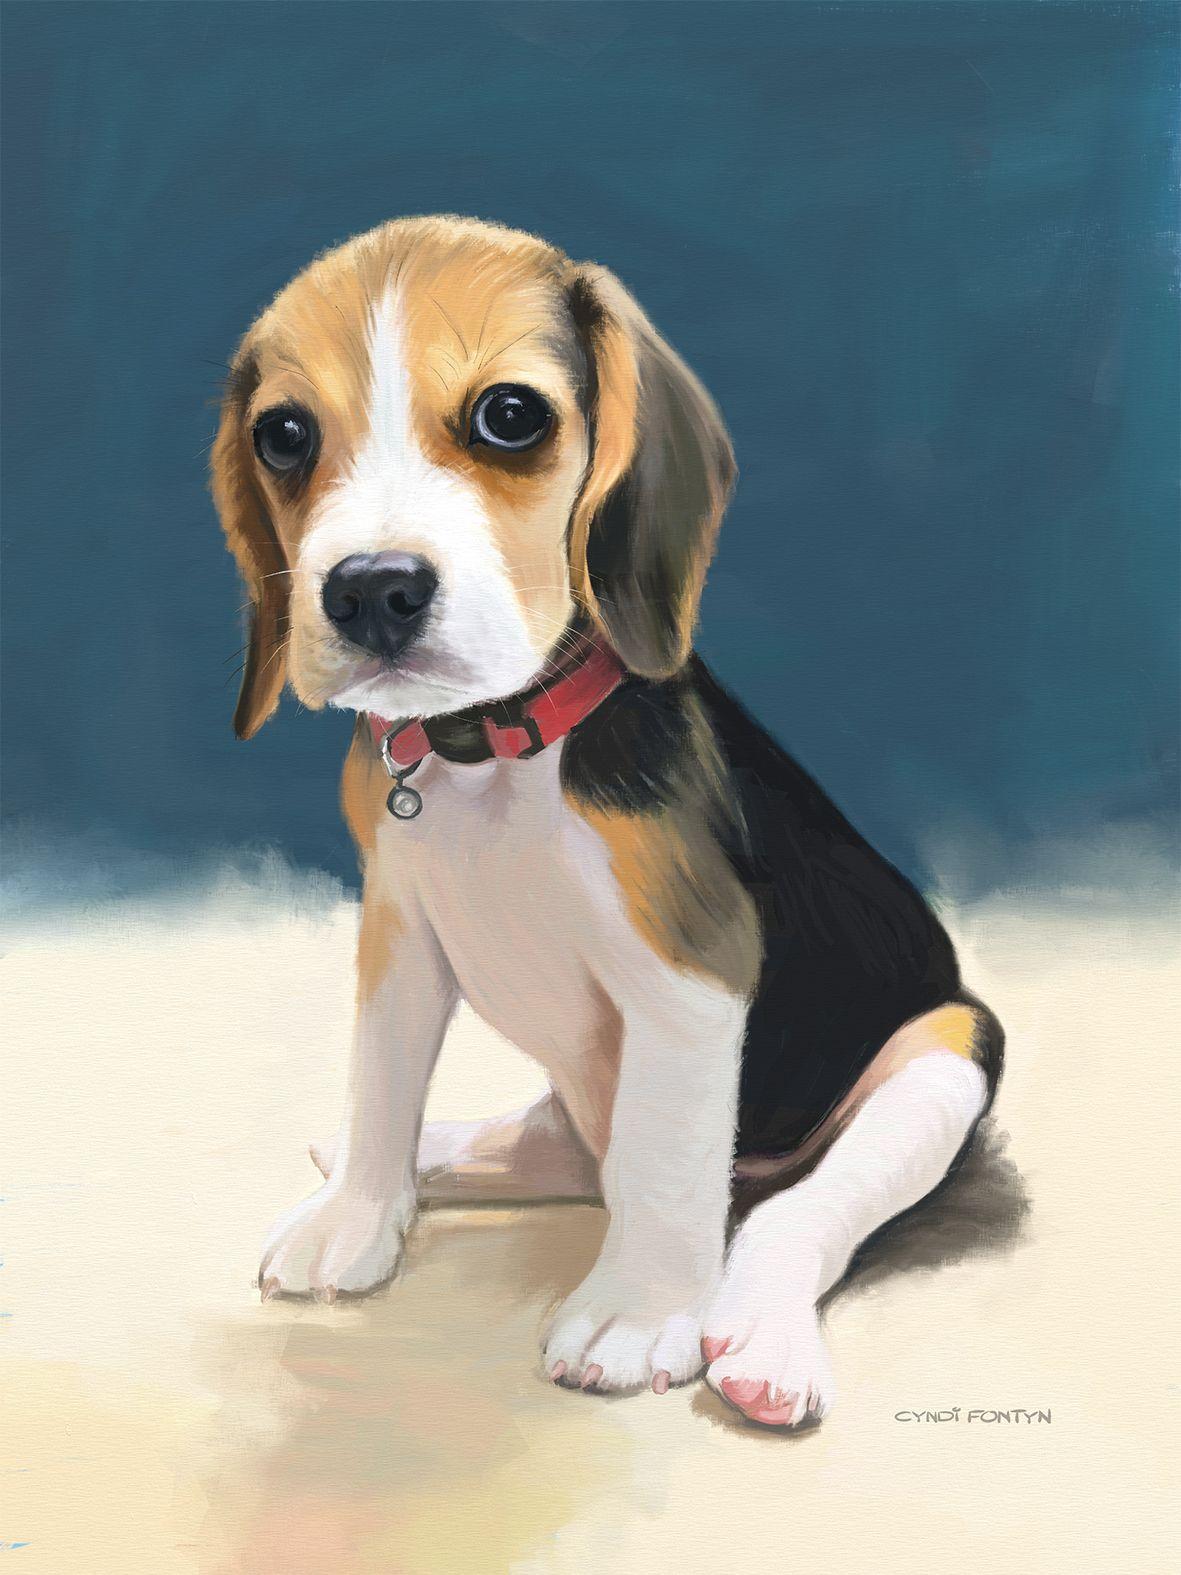 Beagle Puppy Digital Painting Pet Portraits Made By Cyndi Fontyn